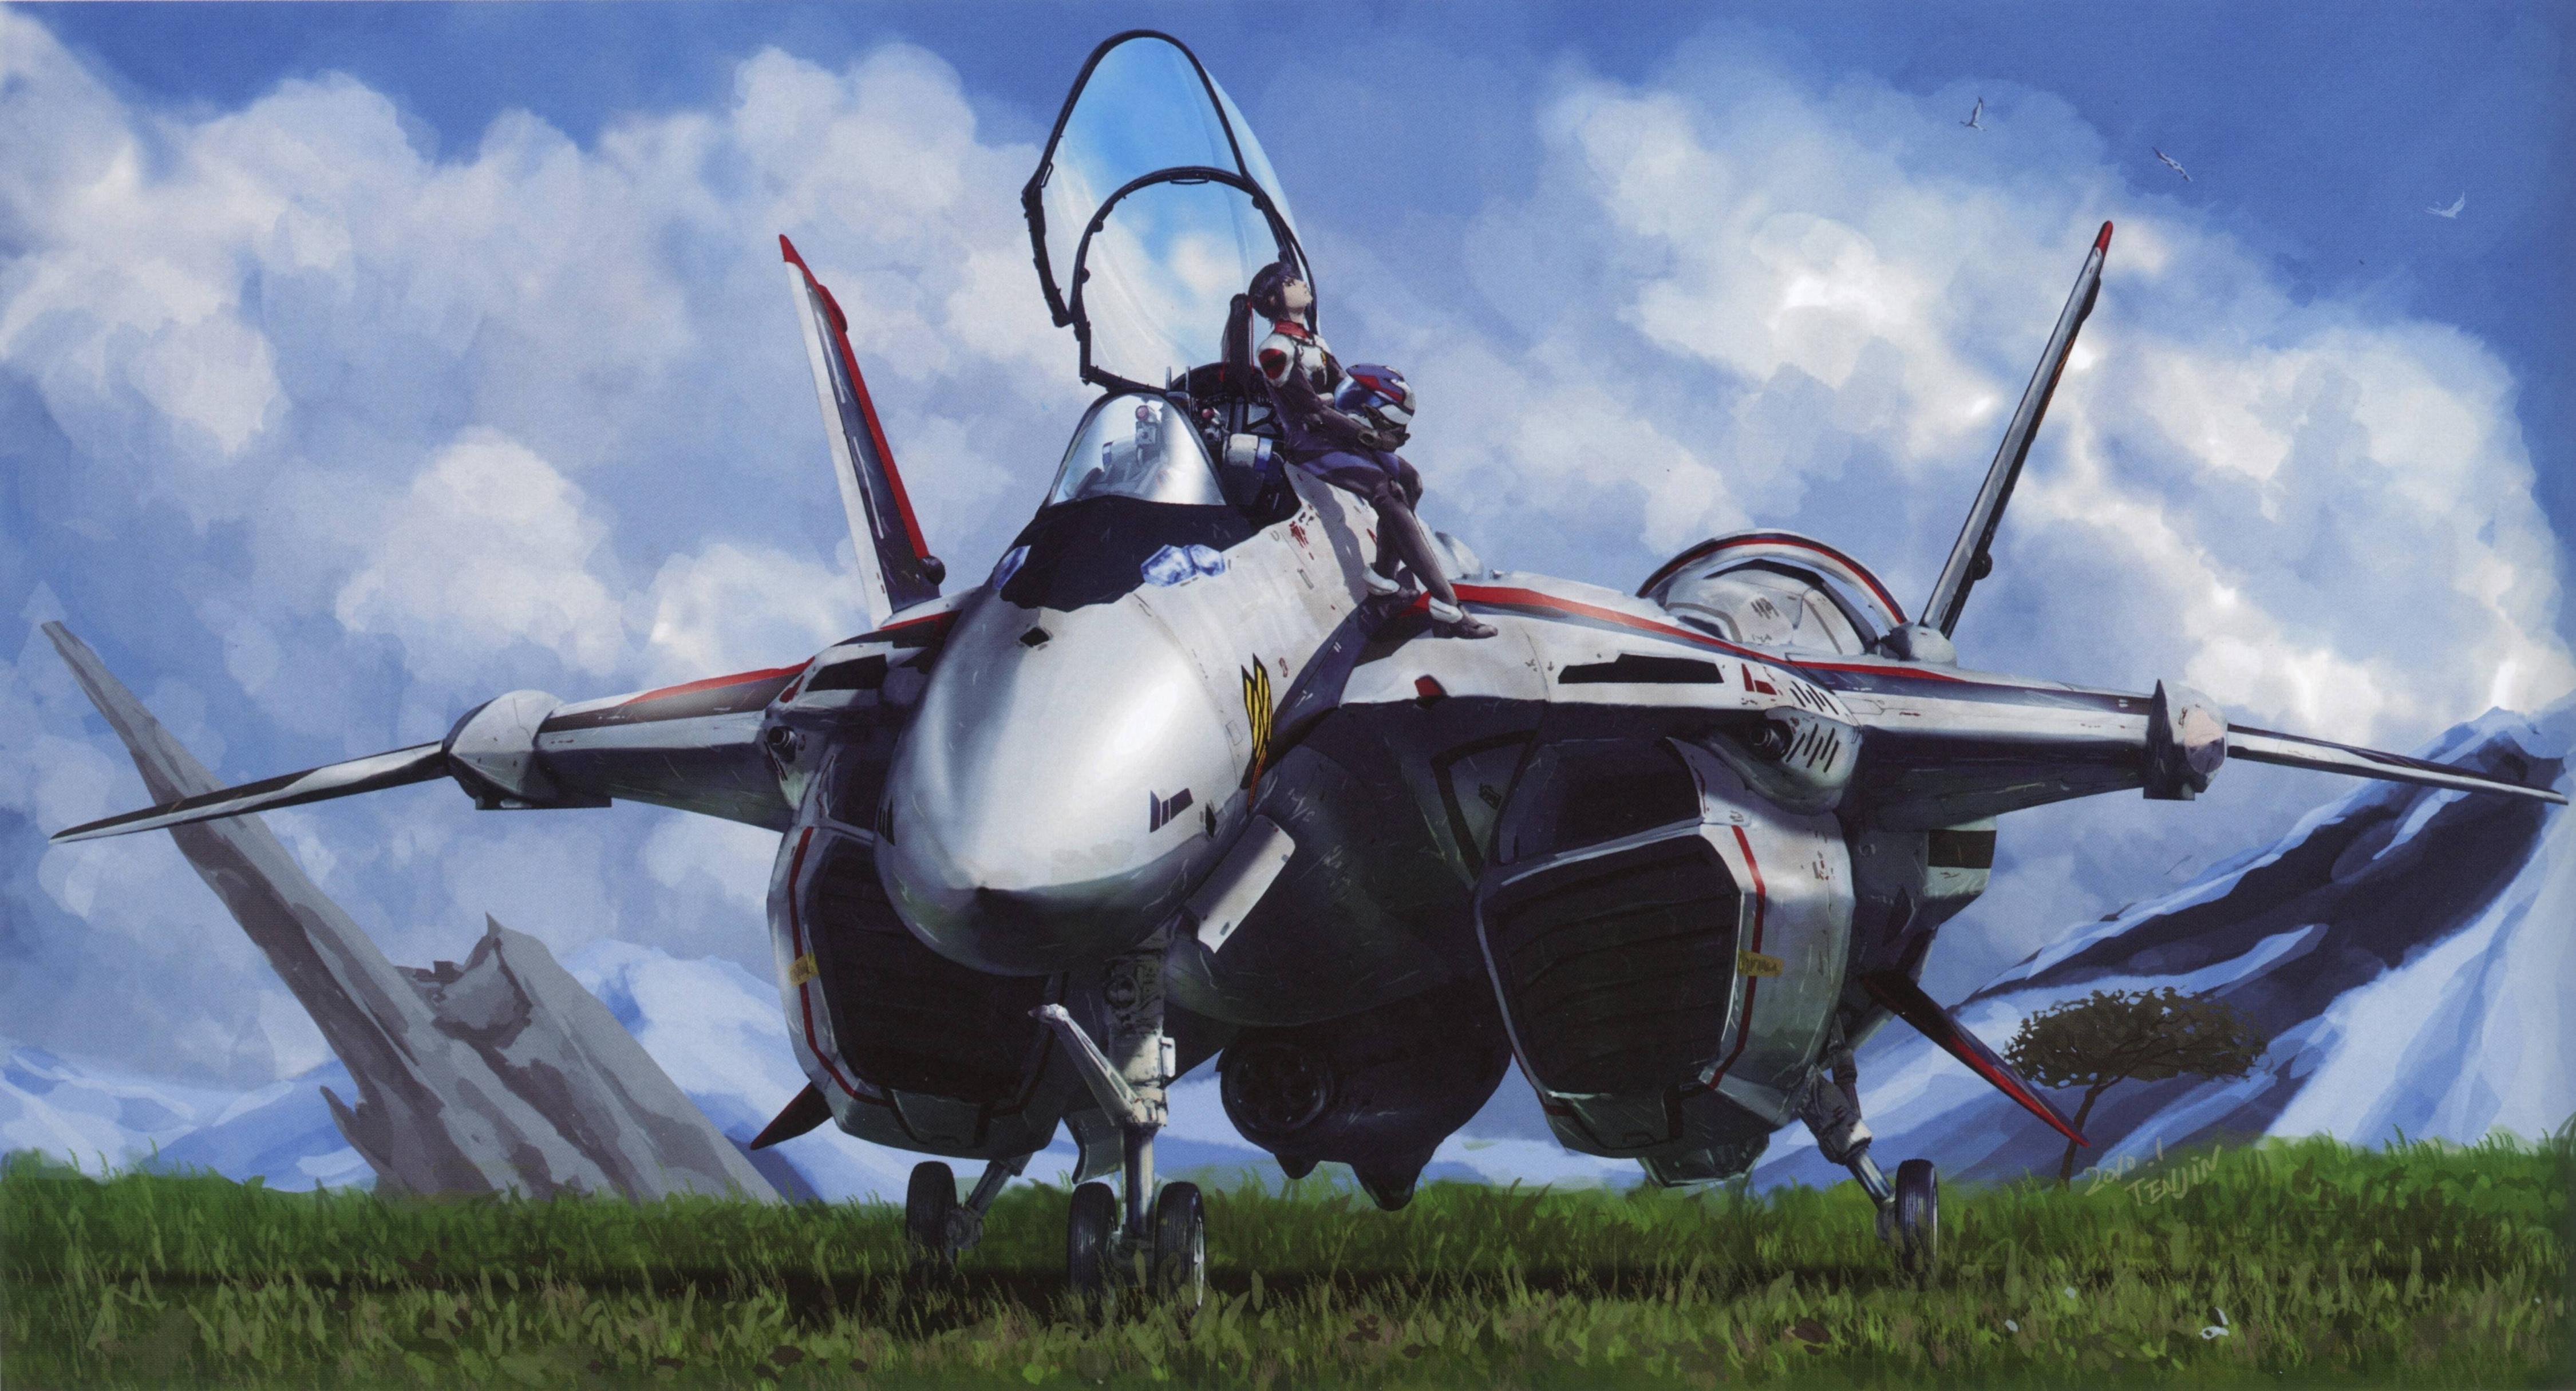 Pin Aircrafts Macross Wallpaper 1920x1200 Military On Pinterest